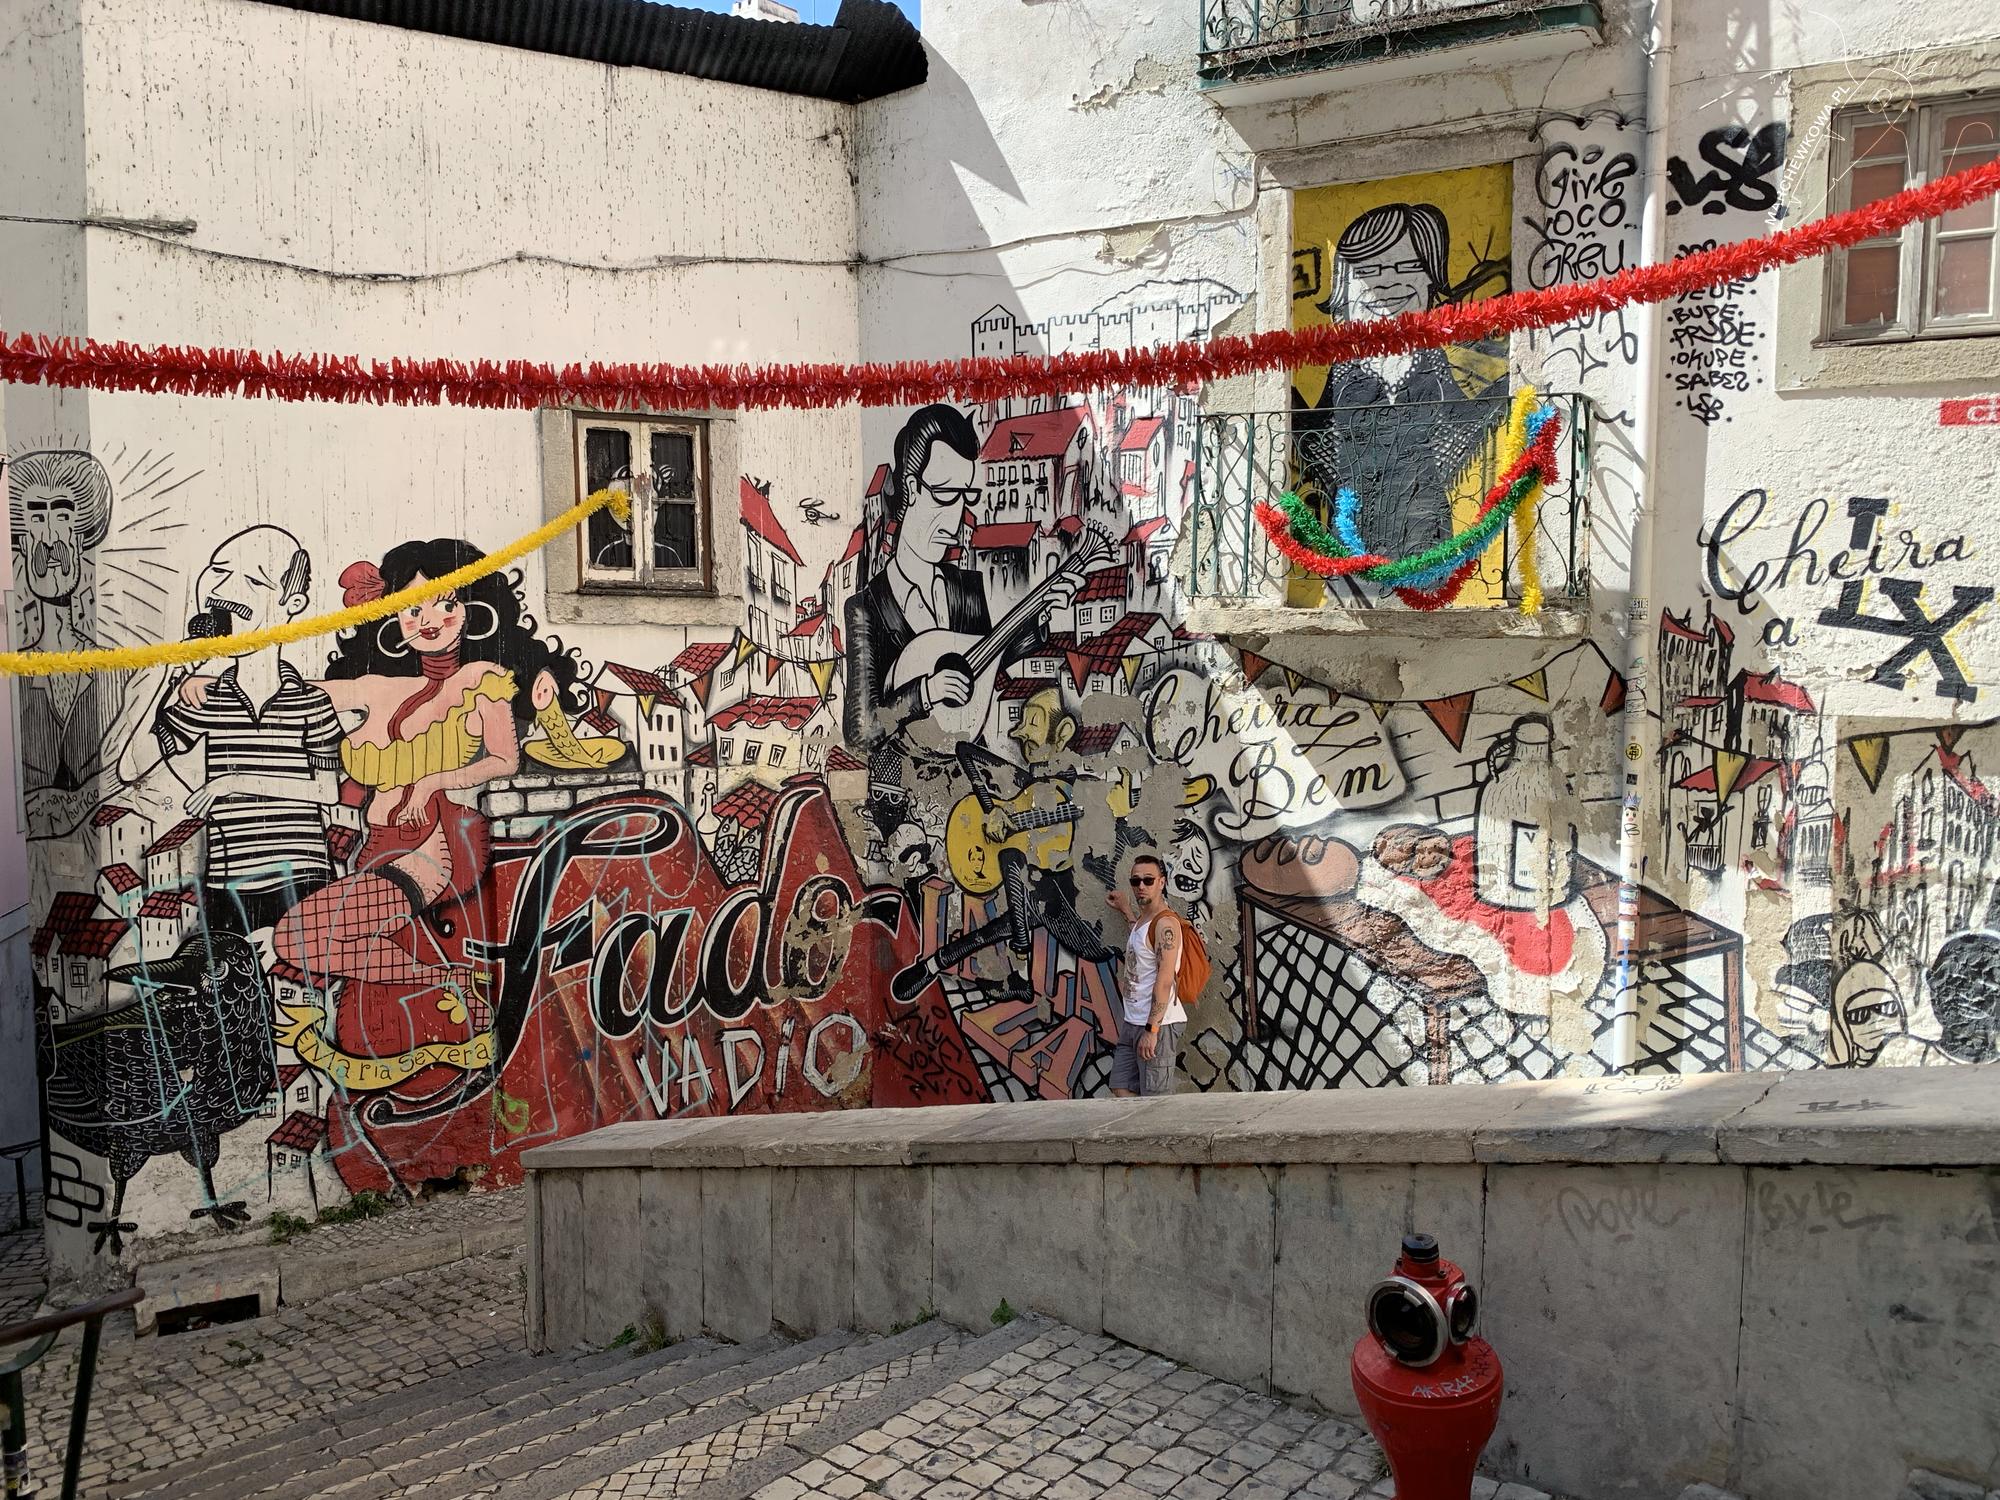 marchewkowa, blog, podróże, urlop, wakacje, Portugalia, Lizbona, Mouraria, fado, travel, Lisboa, Nuno Saraiva, fado, grafitti